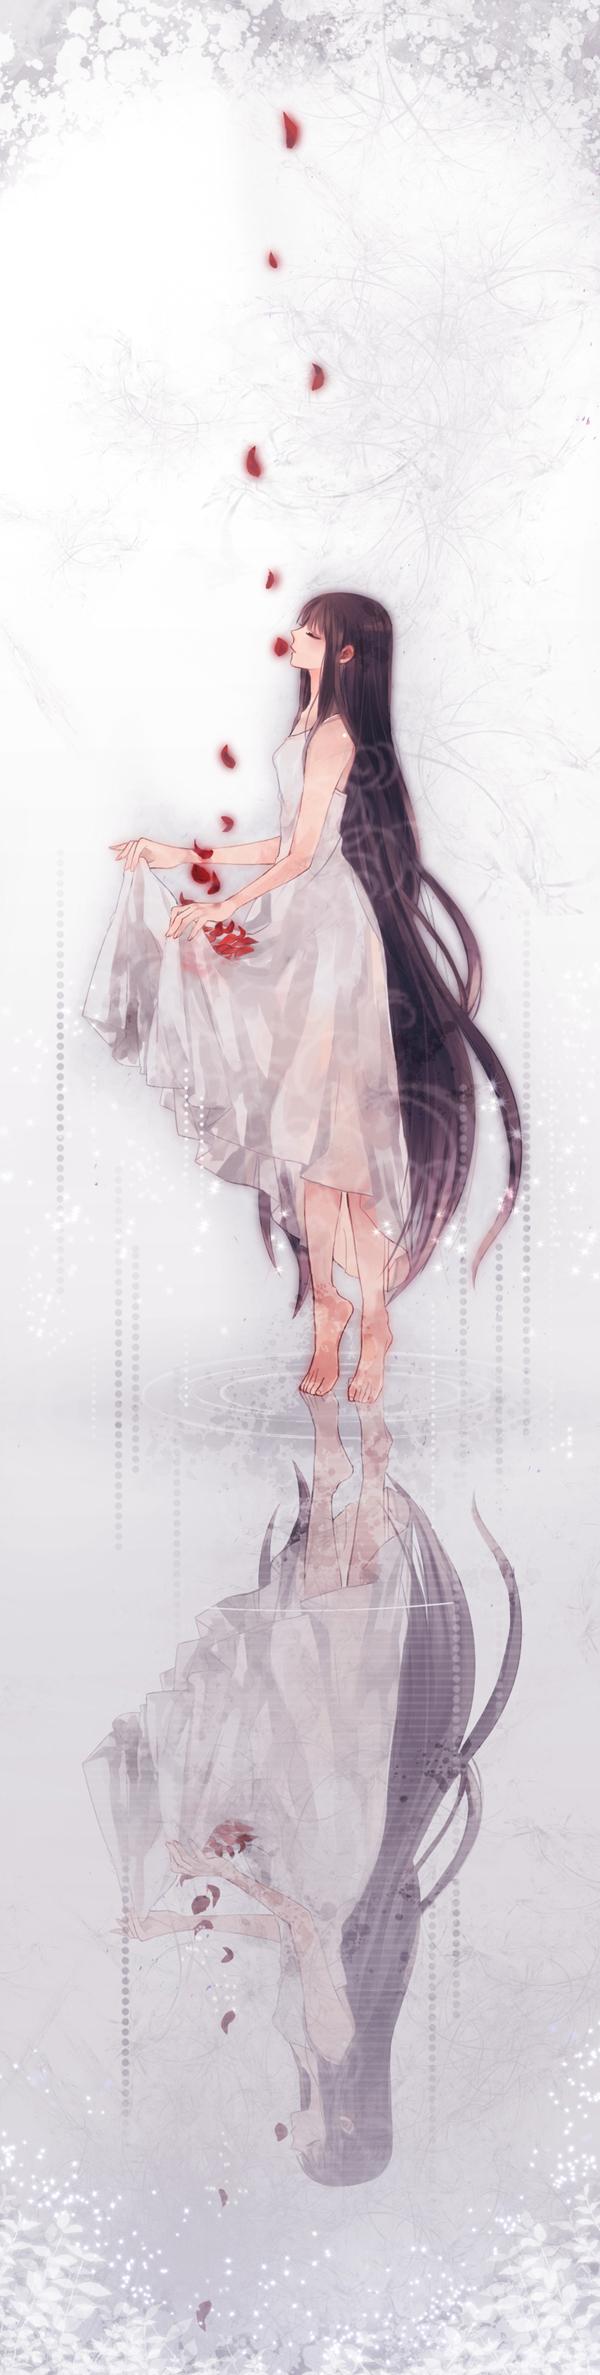 Tags: Anime, Toryufu, Gown, Walking On Water, Pixiv, Original